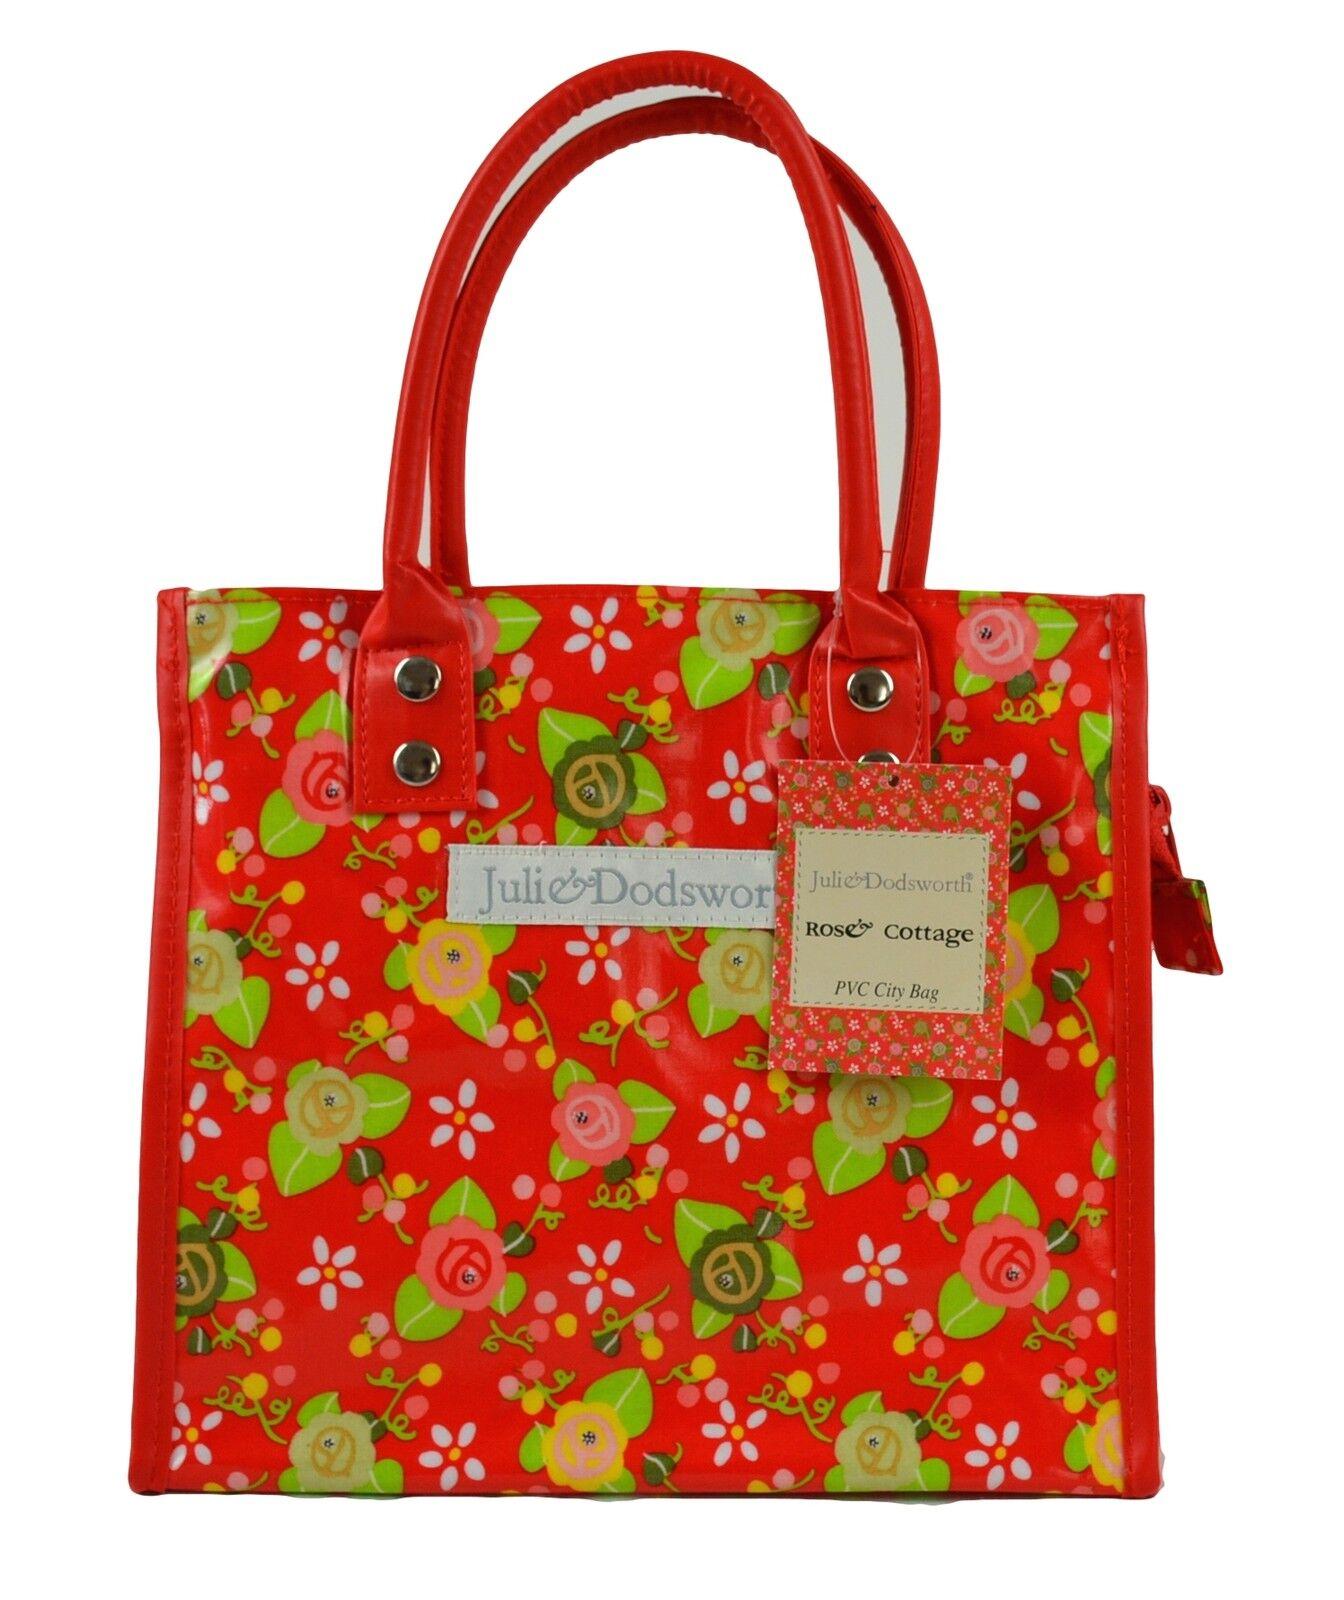 Julie Dodsworth PVC City Bag Zip /& Clip Top-Small Tote  Choose Design